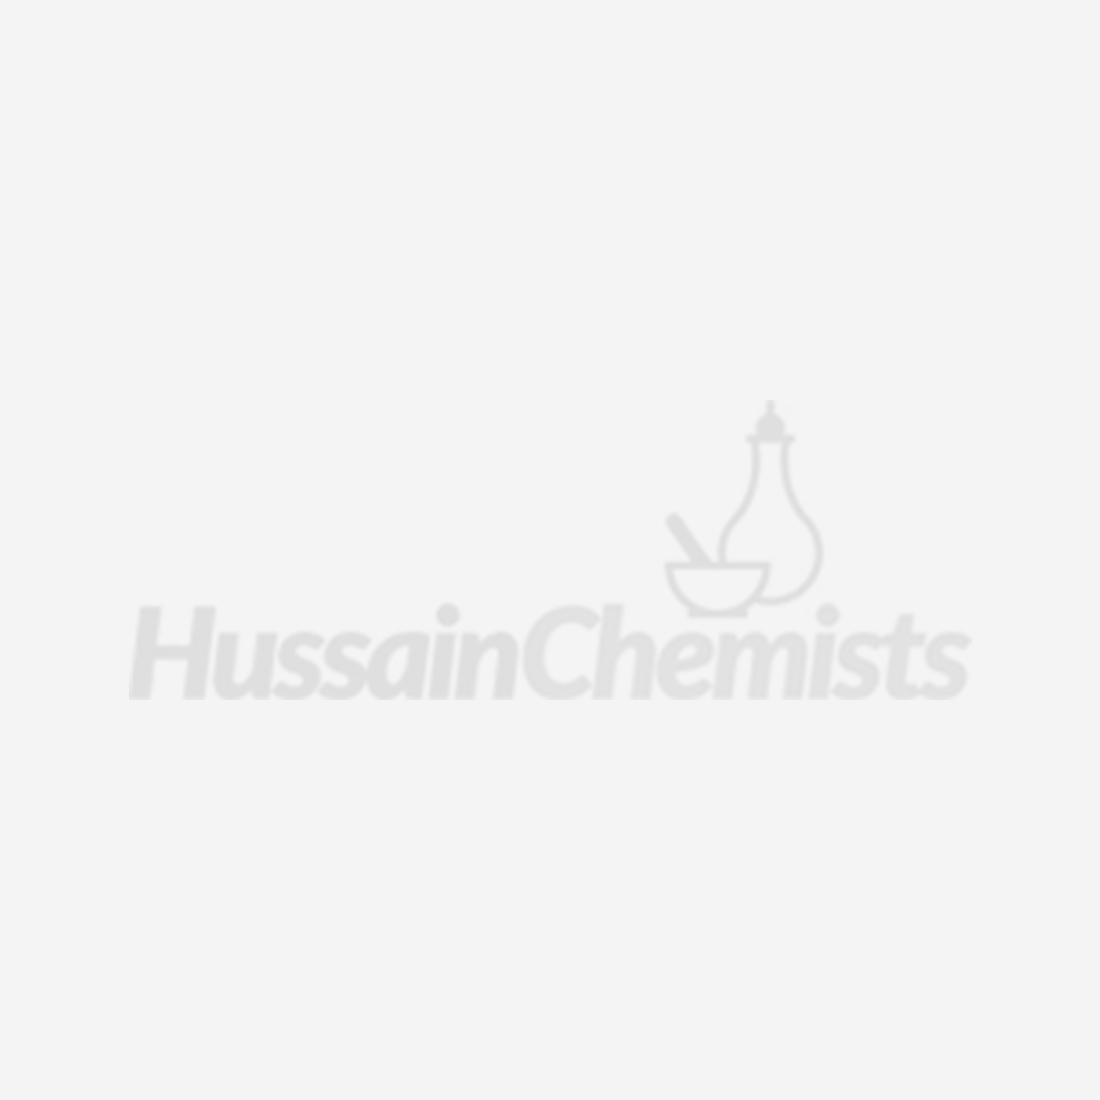 Ibuleve Gel ( Contain Ibuprofen) 50g